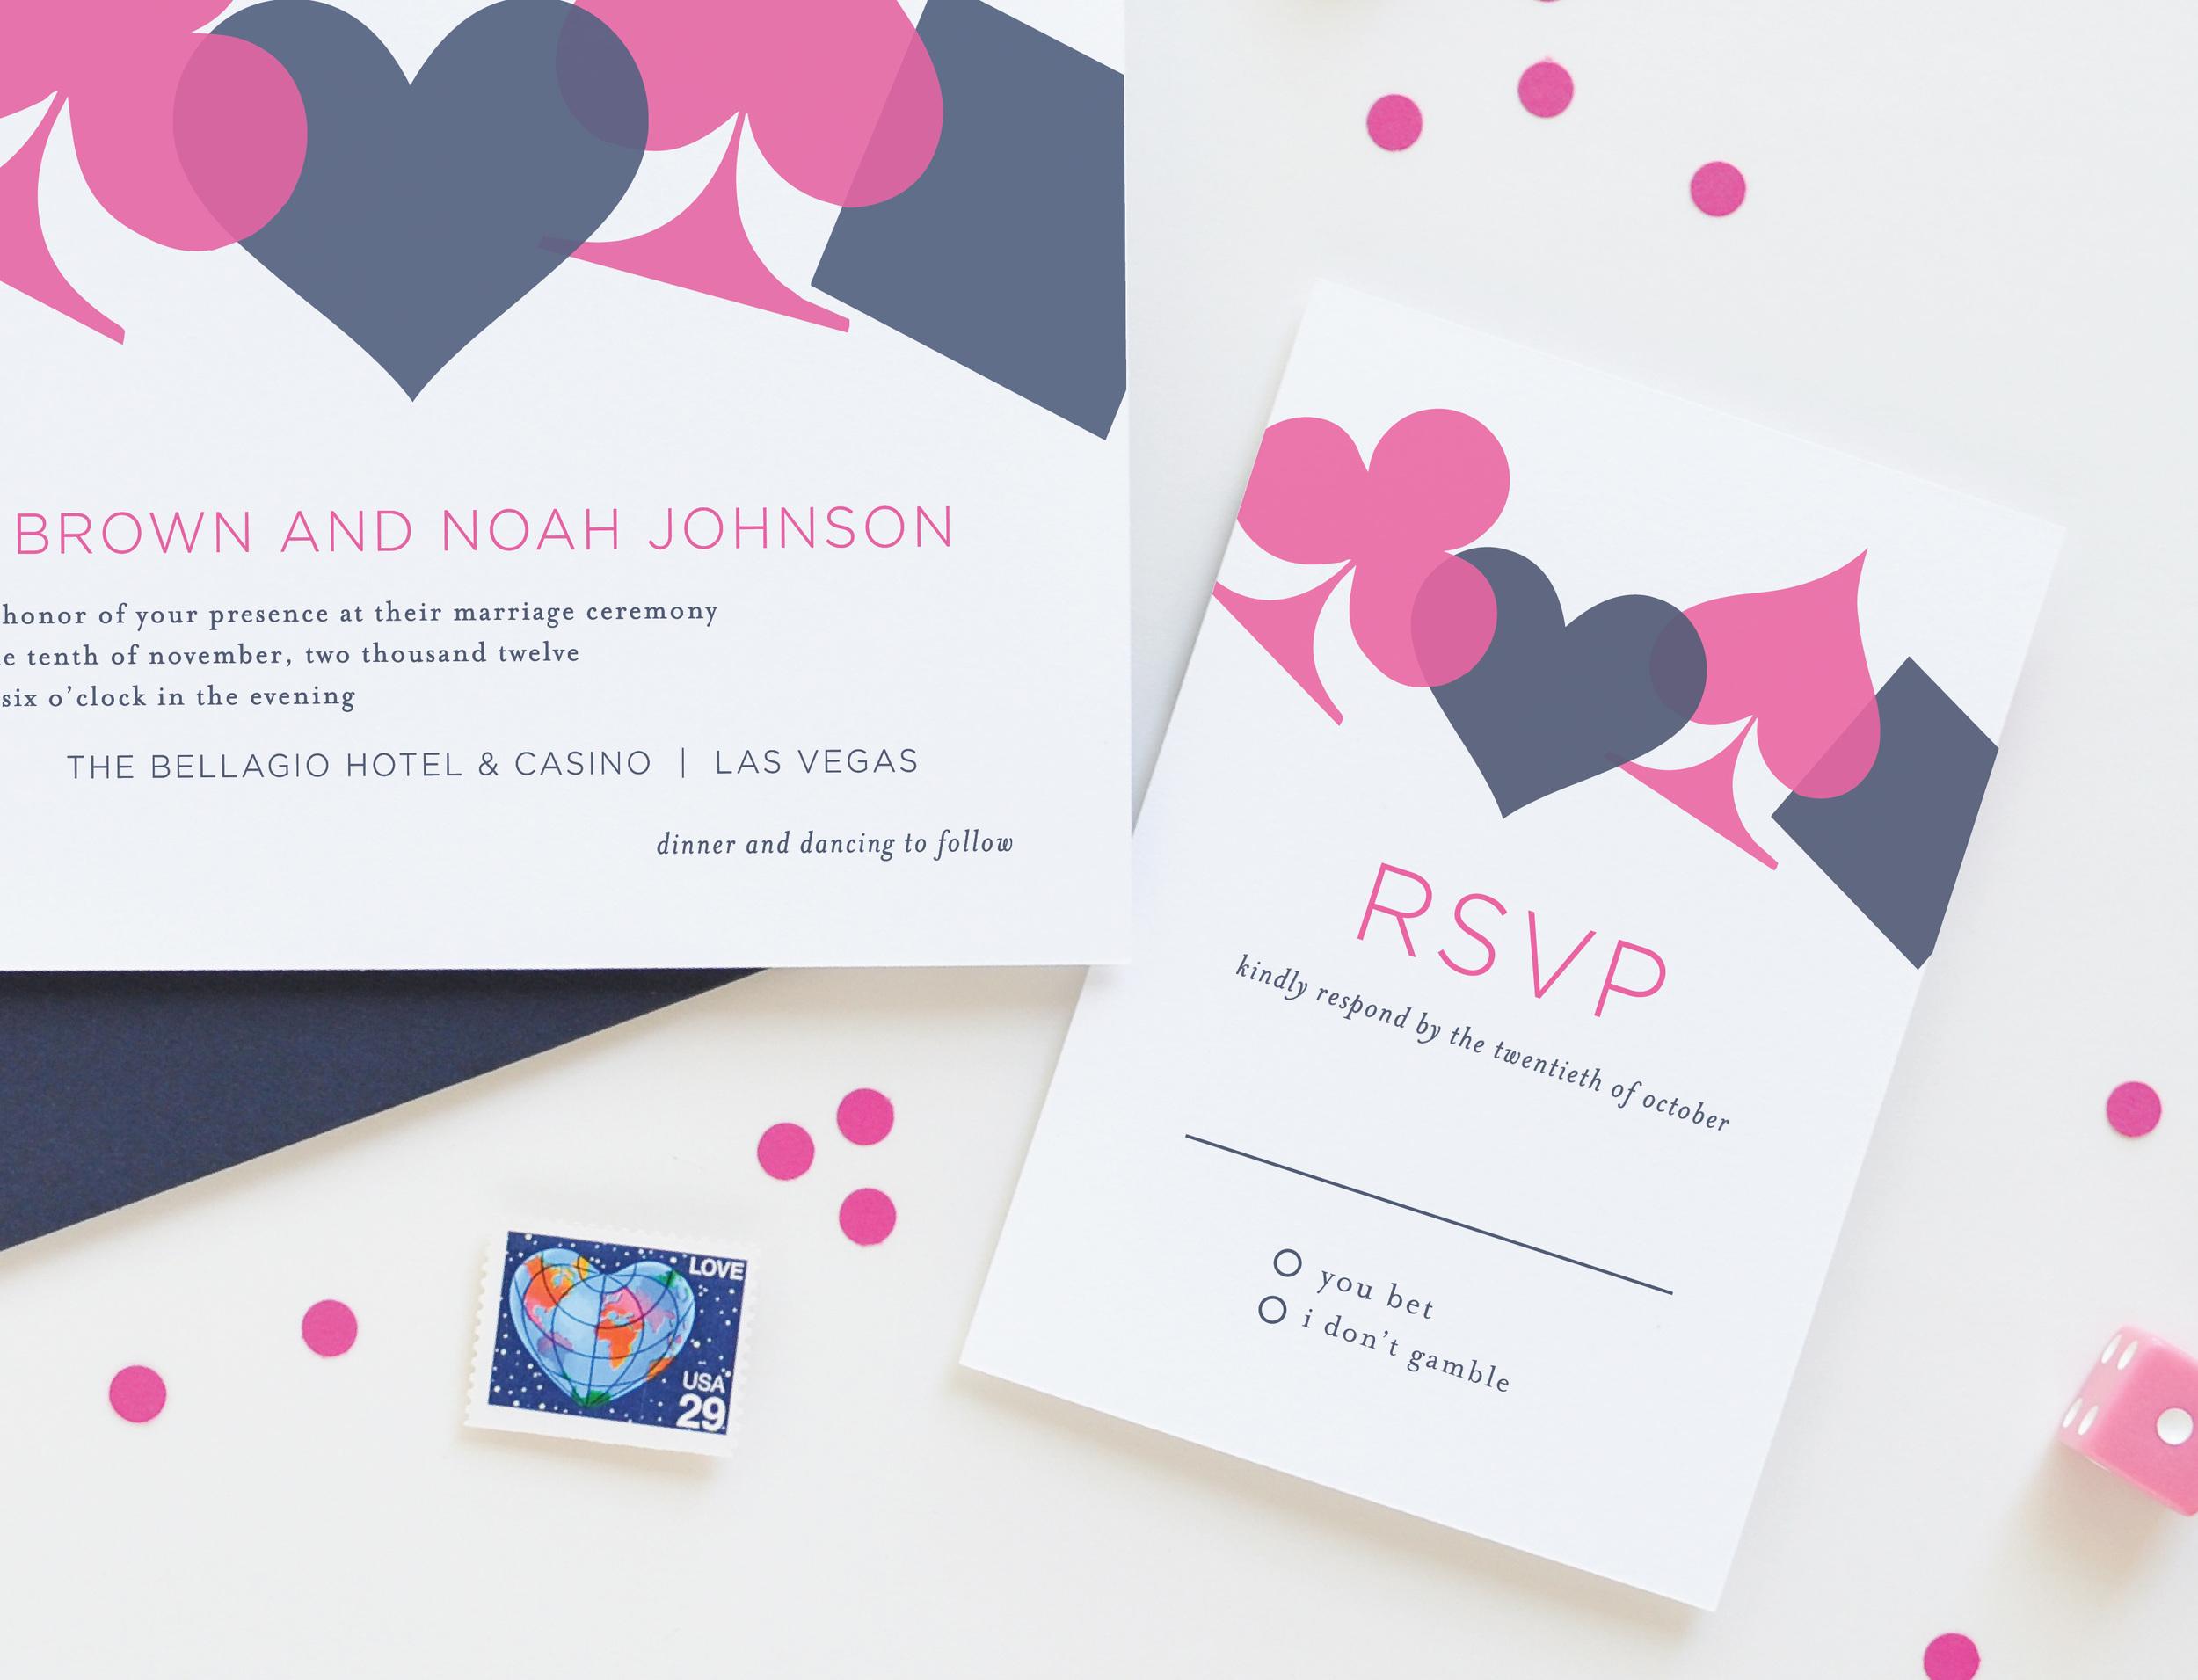 Vegas_Casino Wedding Invitation2-01.jpg